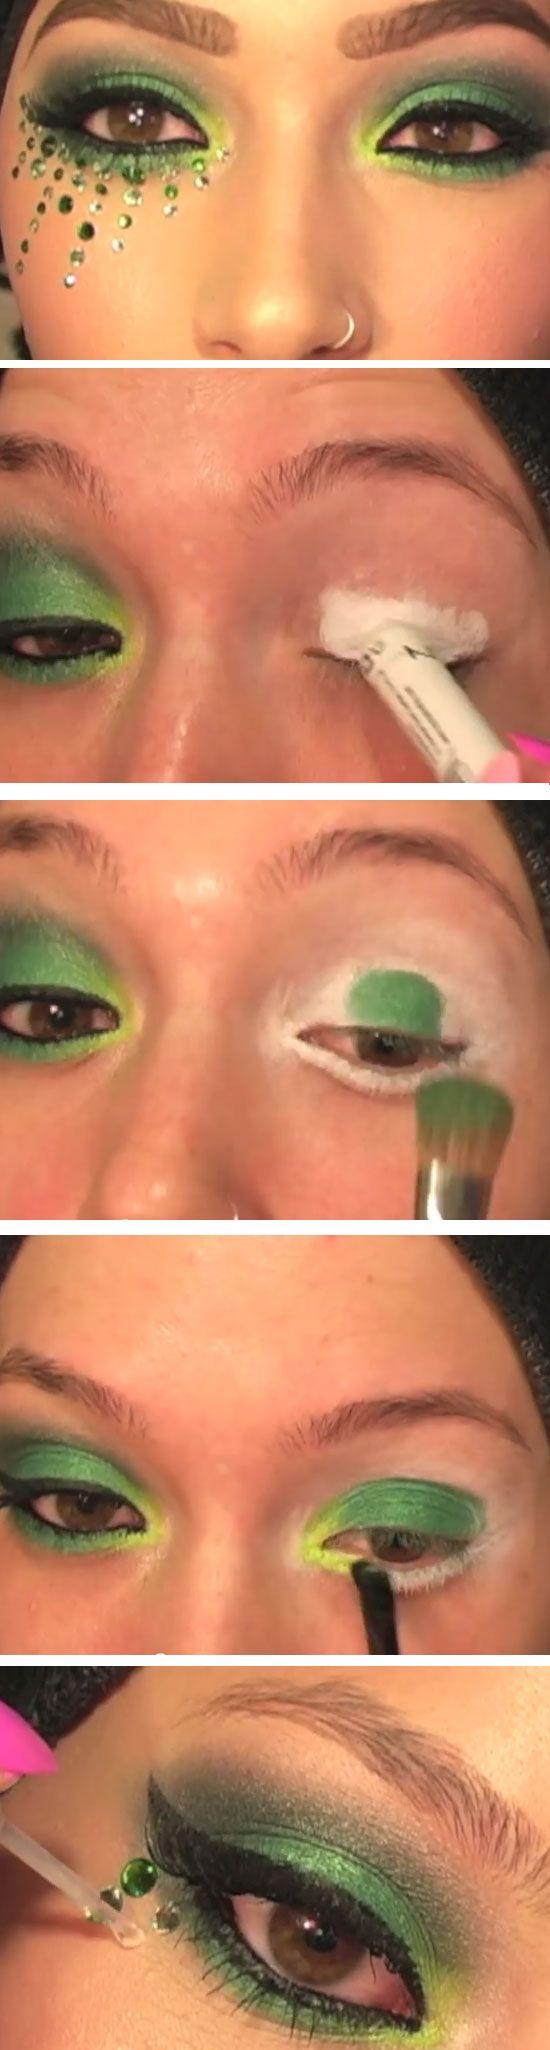 15 cute st patricks day makeup ideas easy eye makeup green 15 cute st patricks day makeup ideas makeup tutorial for beginnerseye makeup baditri Images